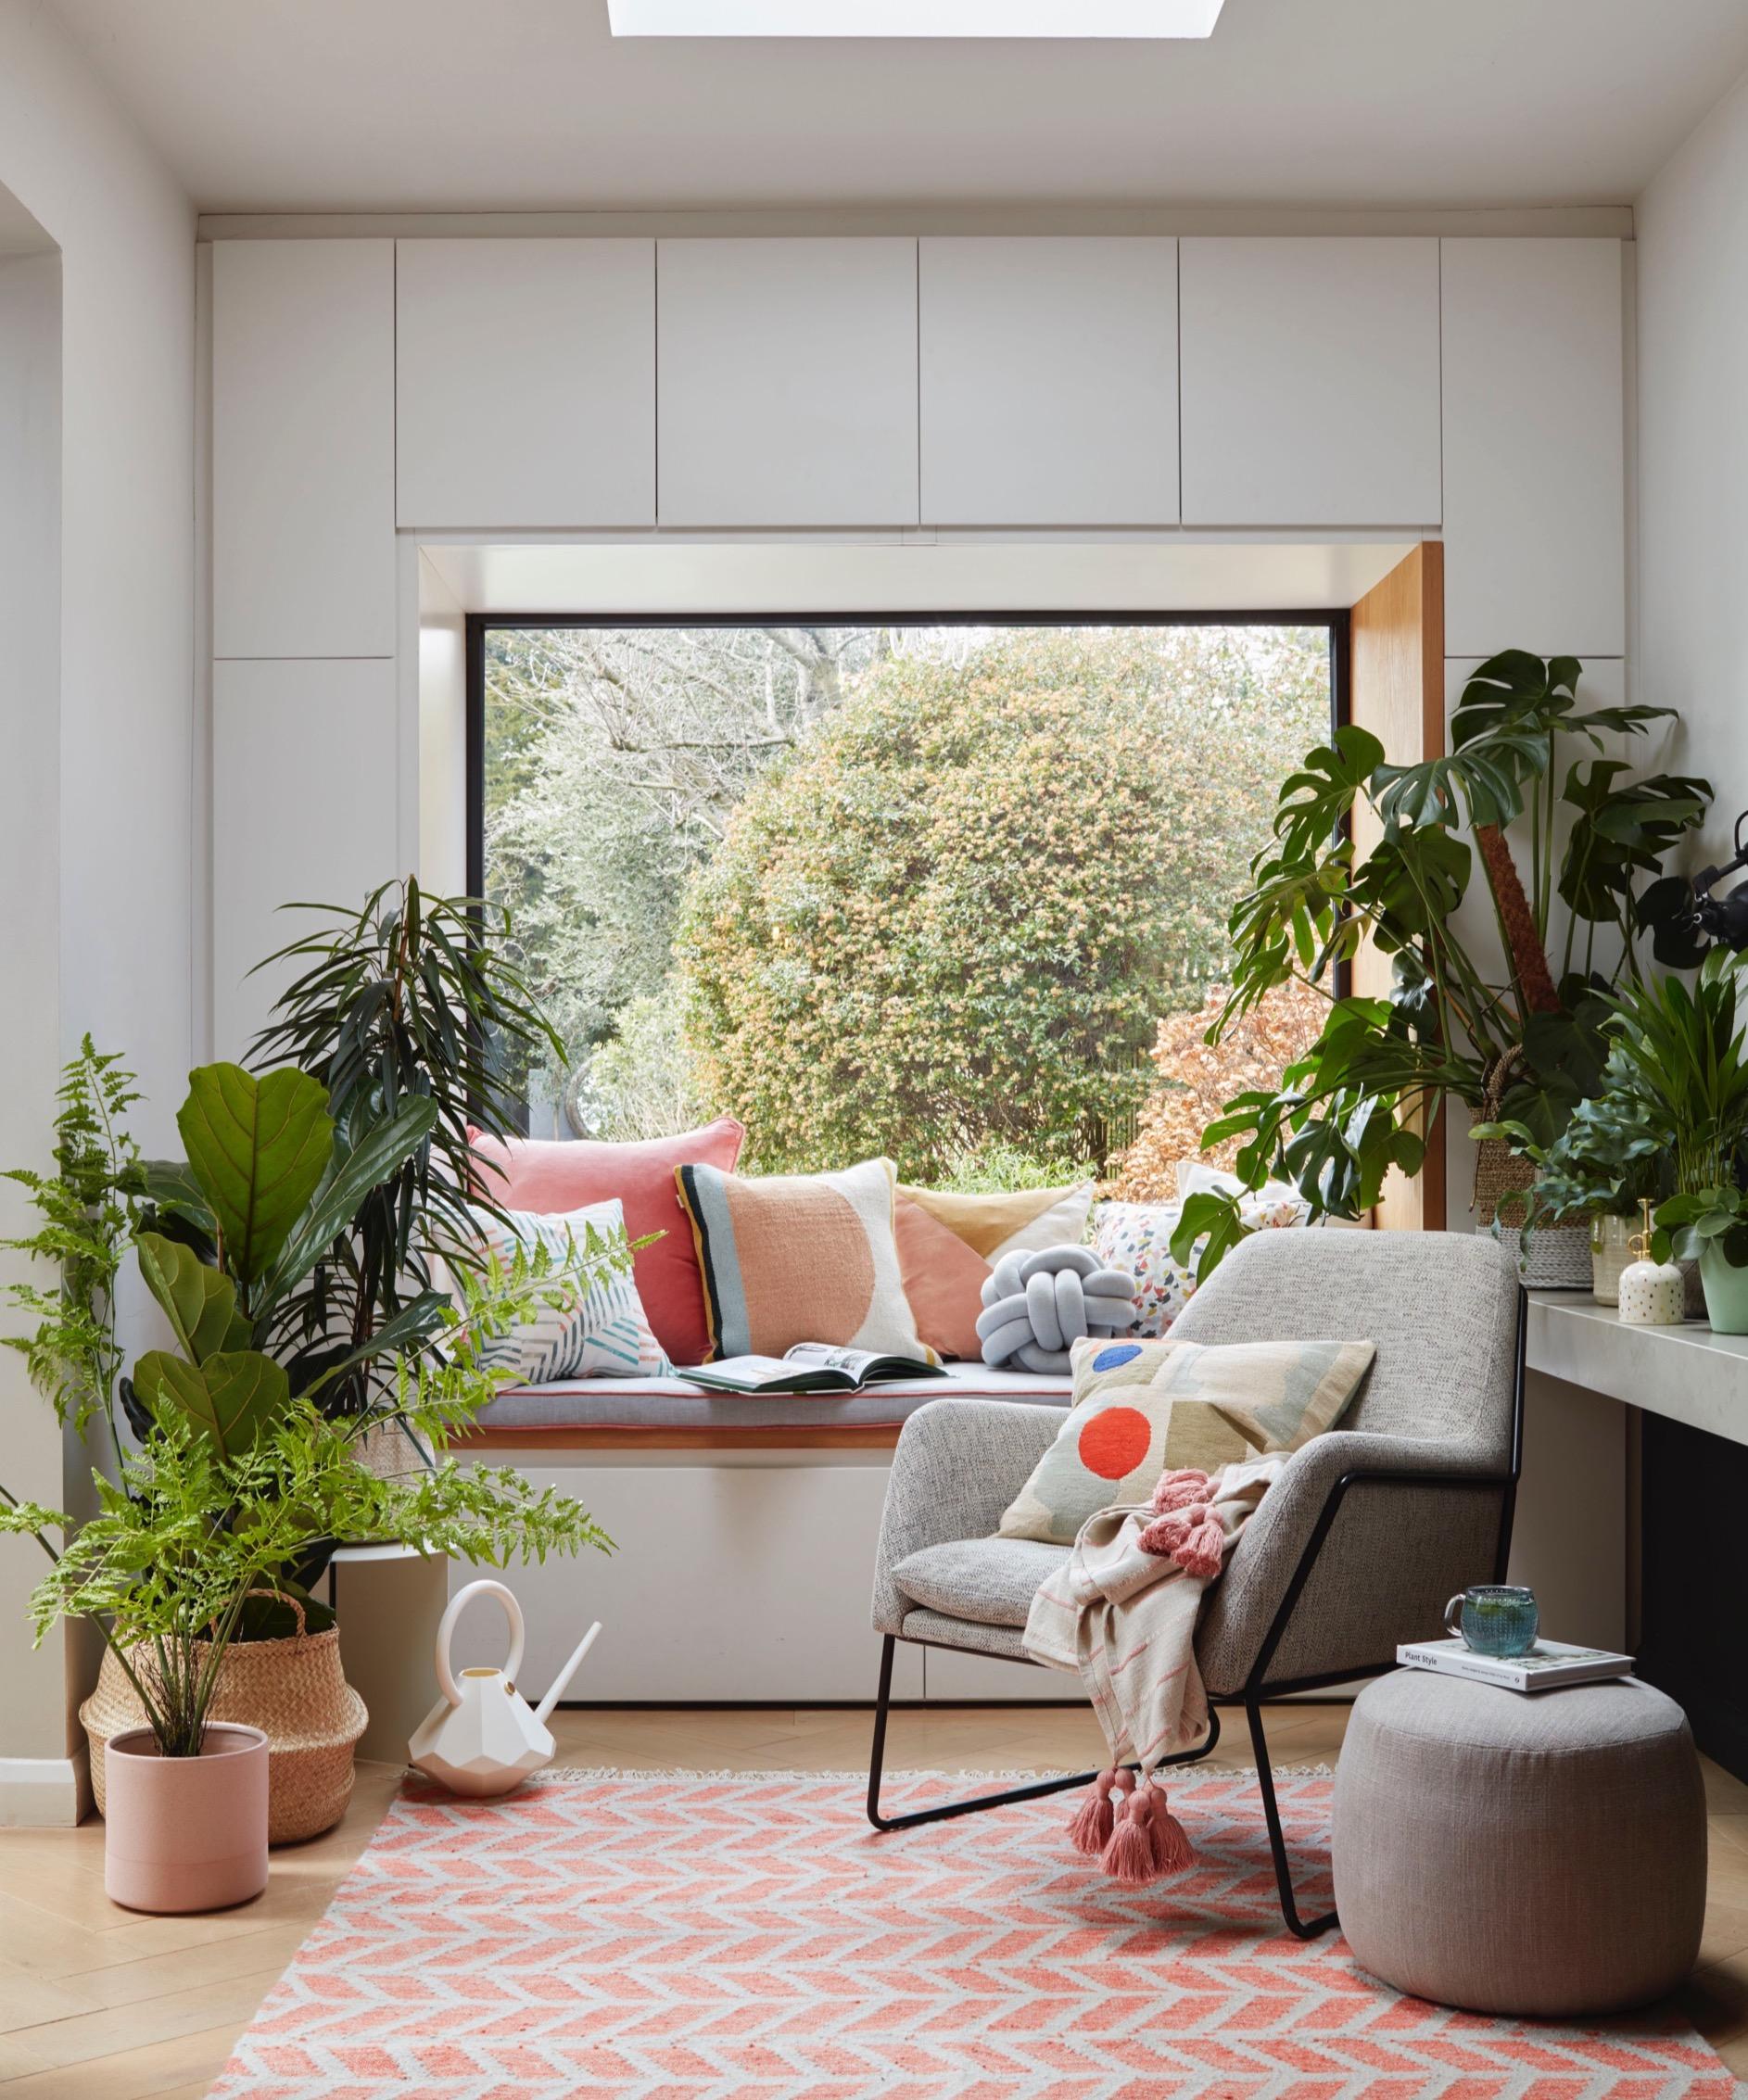 Ideal Home mgazine